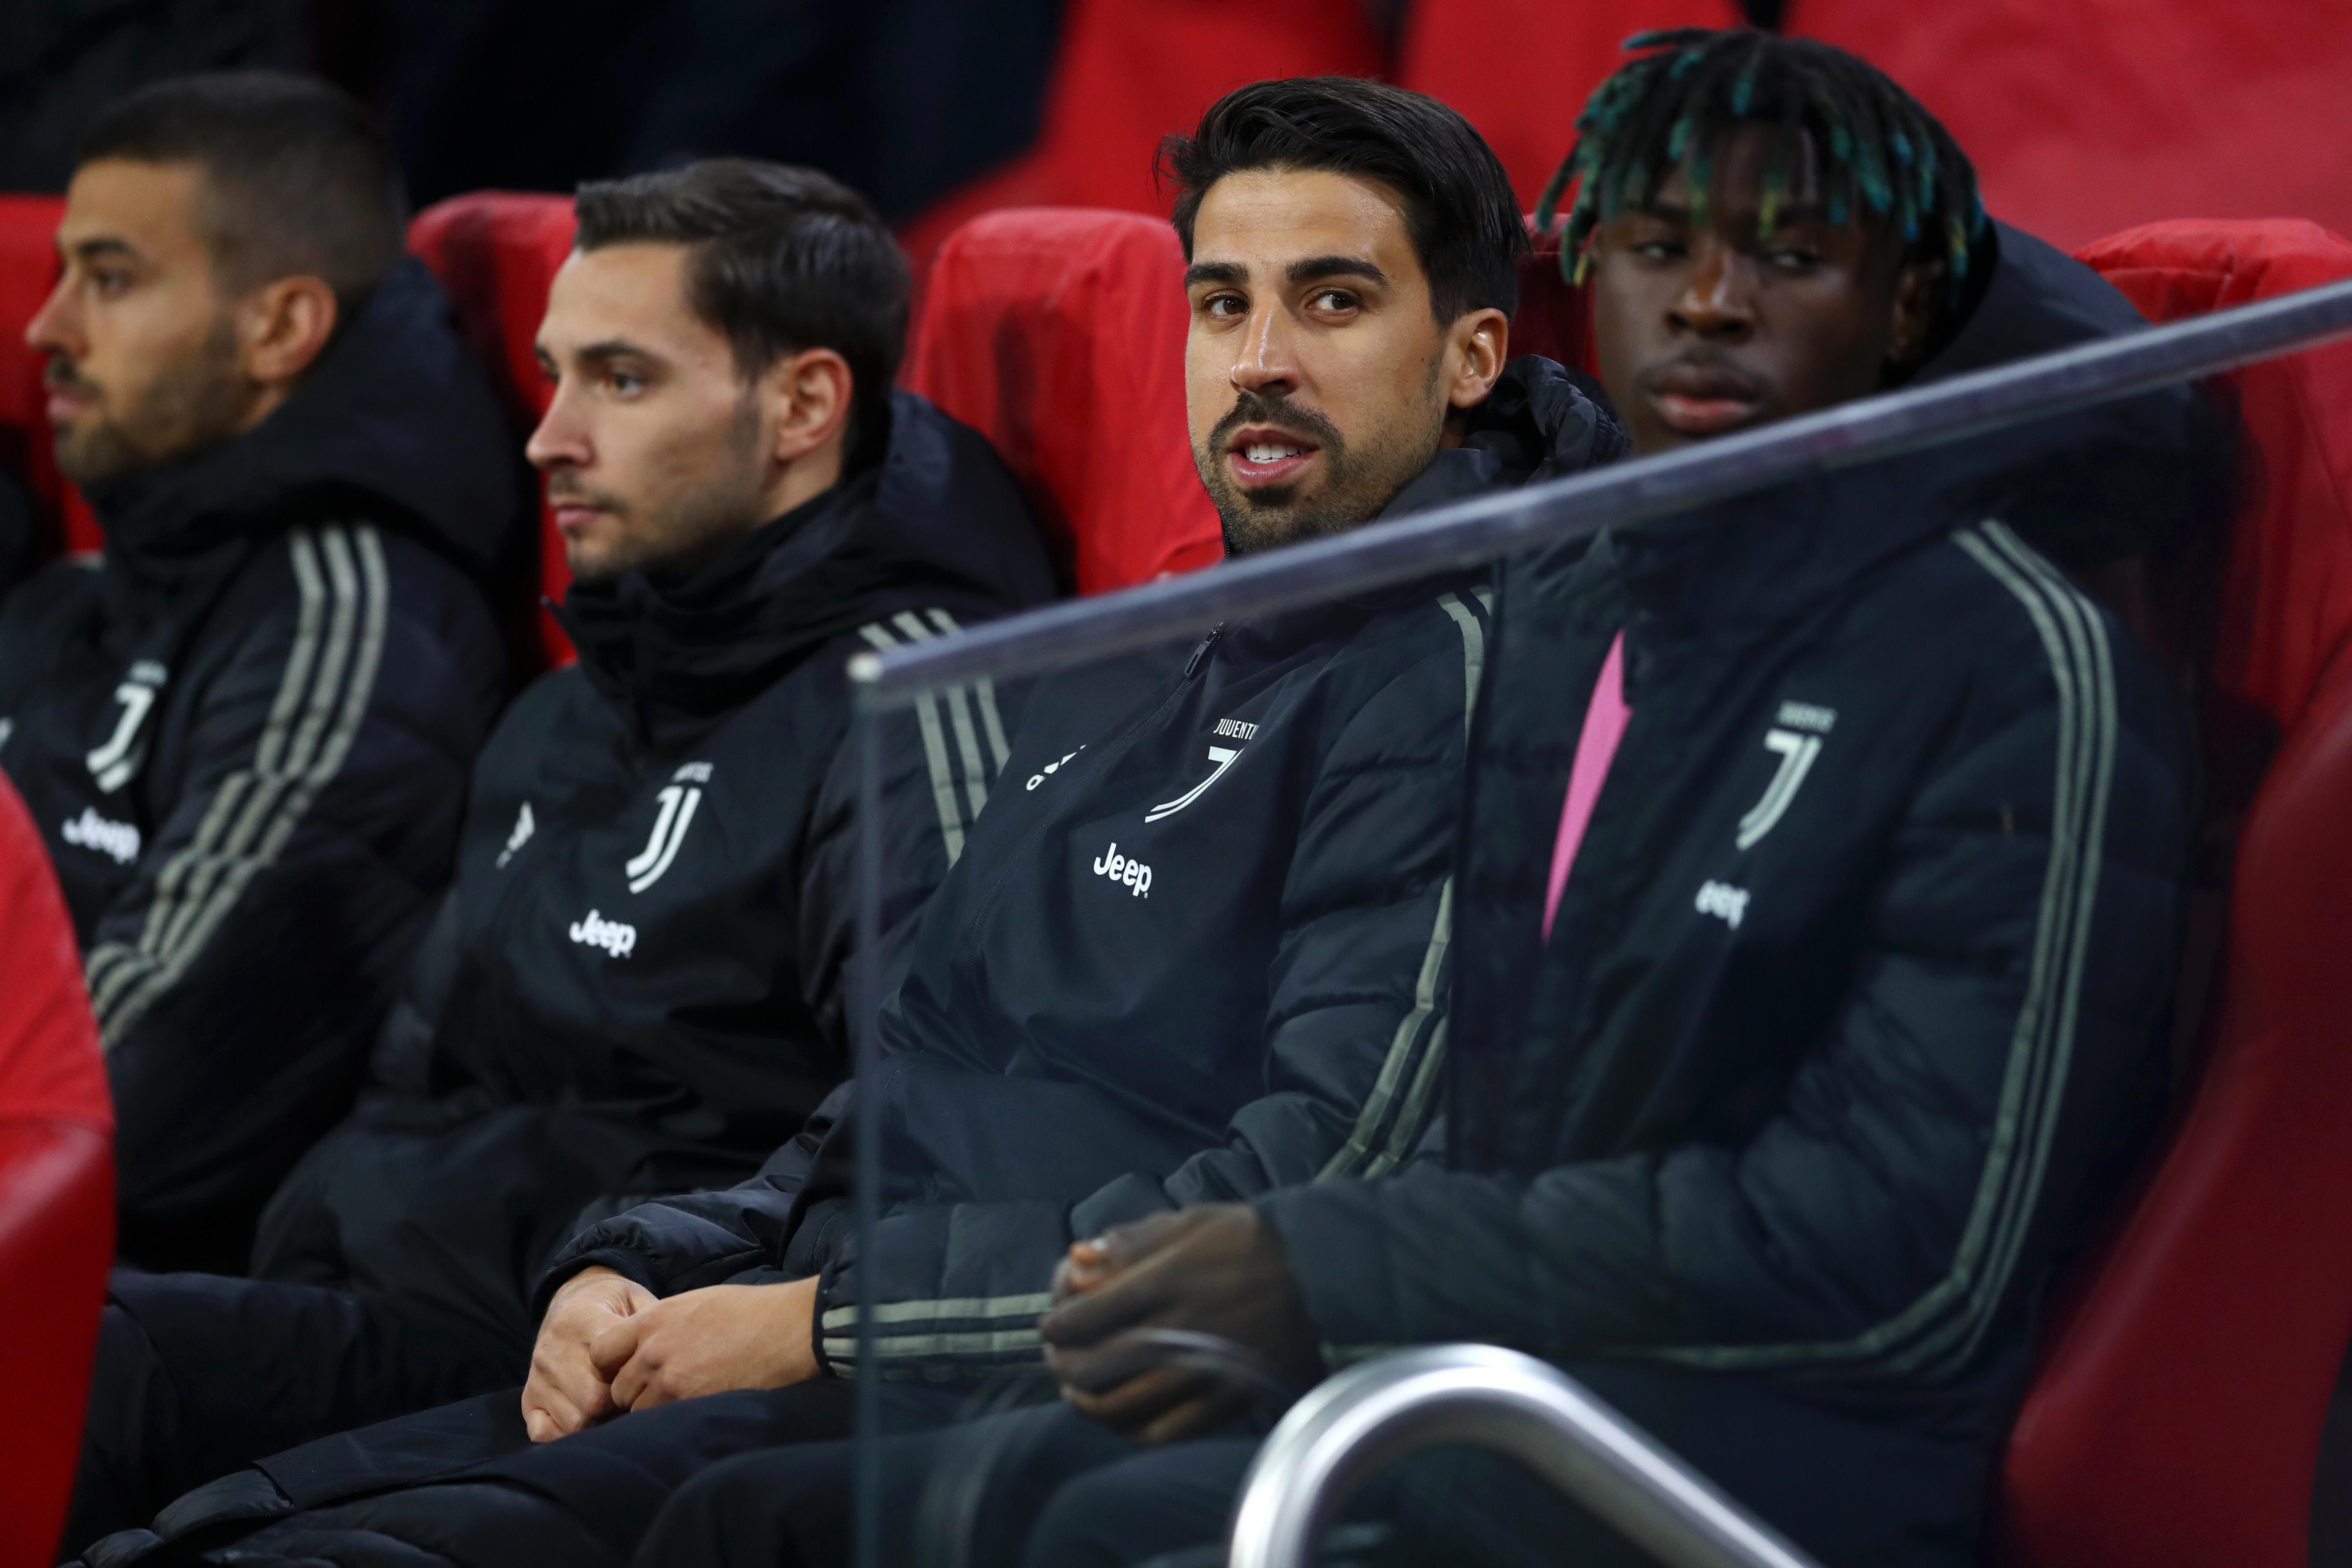 Manchester United target Sami Khedira among the Juventus substitutes